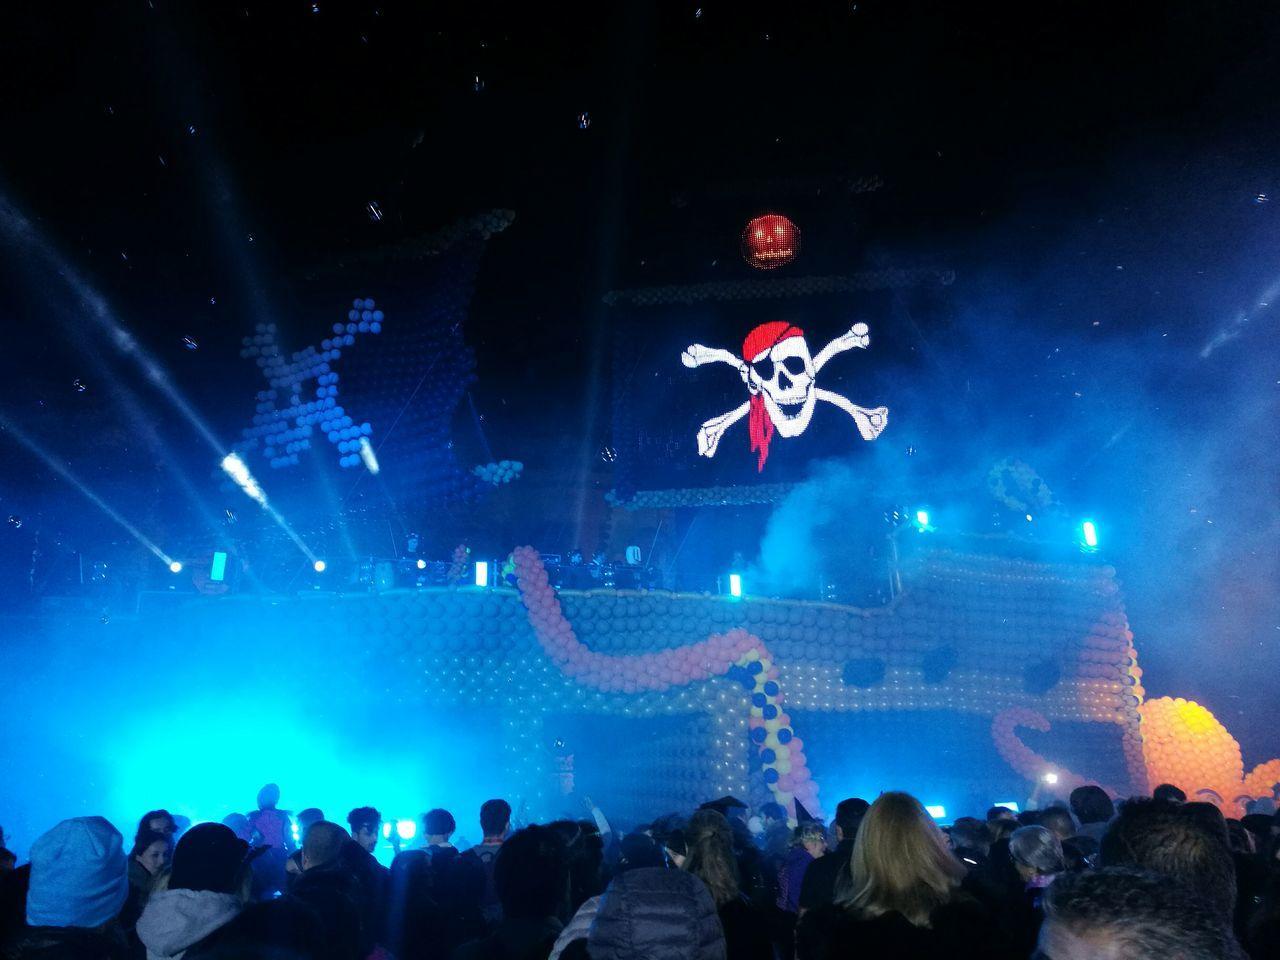 Music Gardaland Halloween Pirateship  Pirates Night People